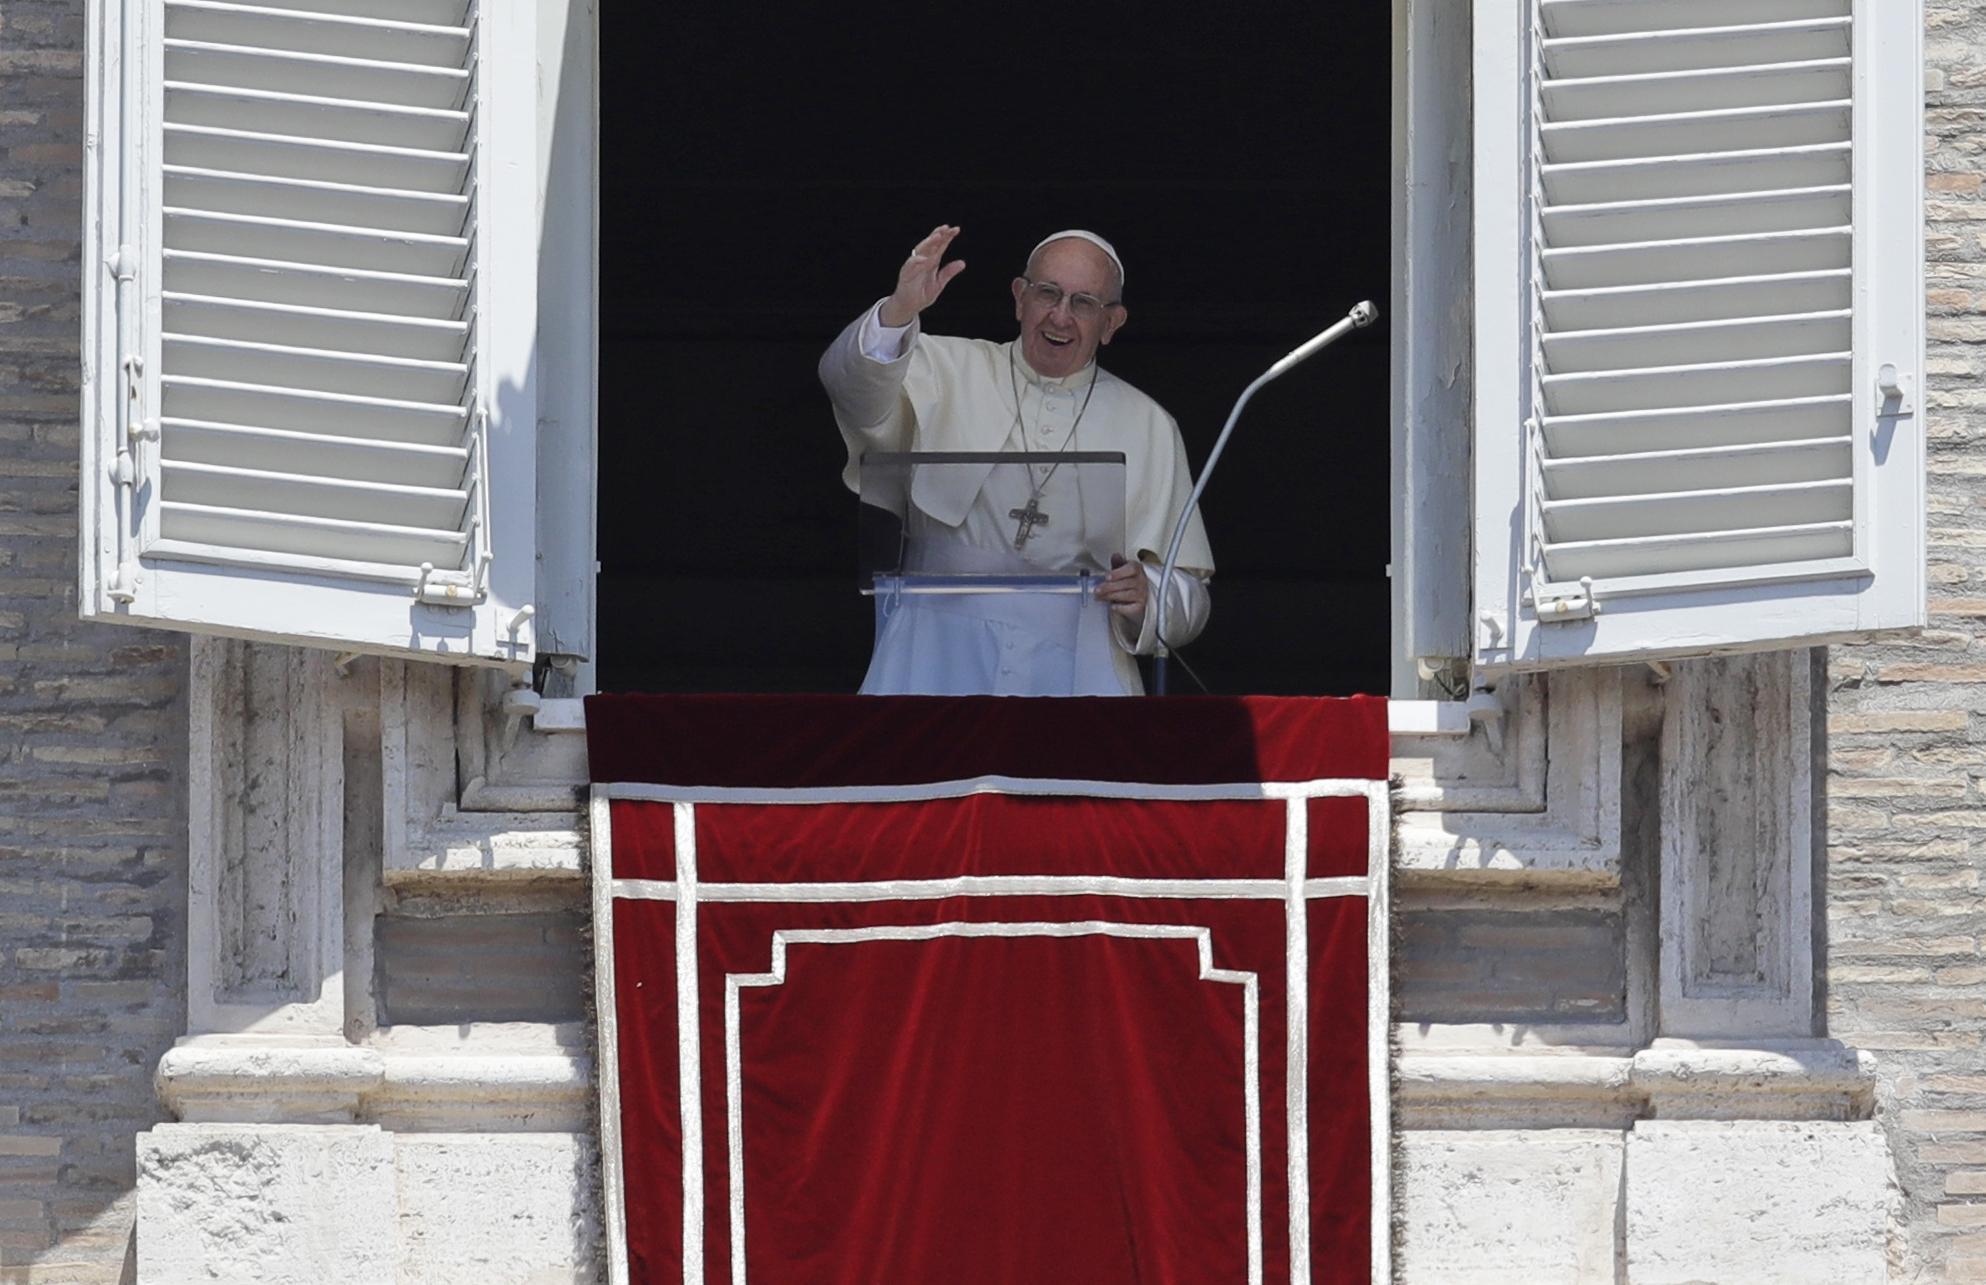 Vatican_Pope_82267-159532.jpg26162383